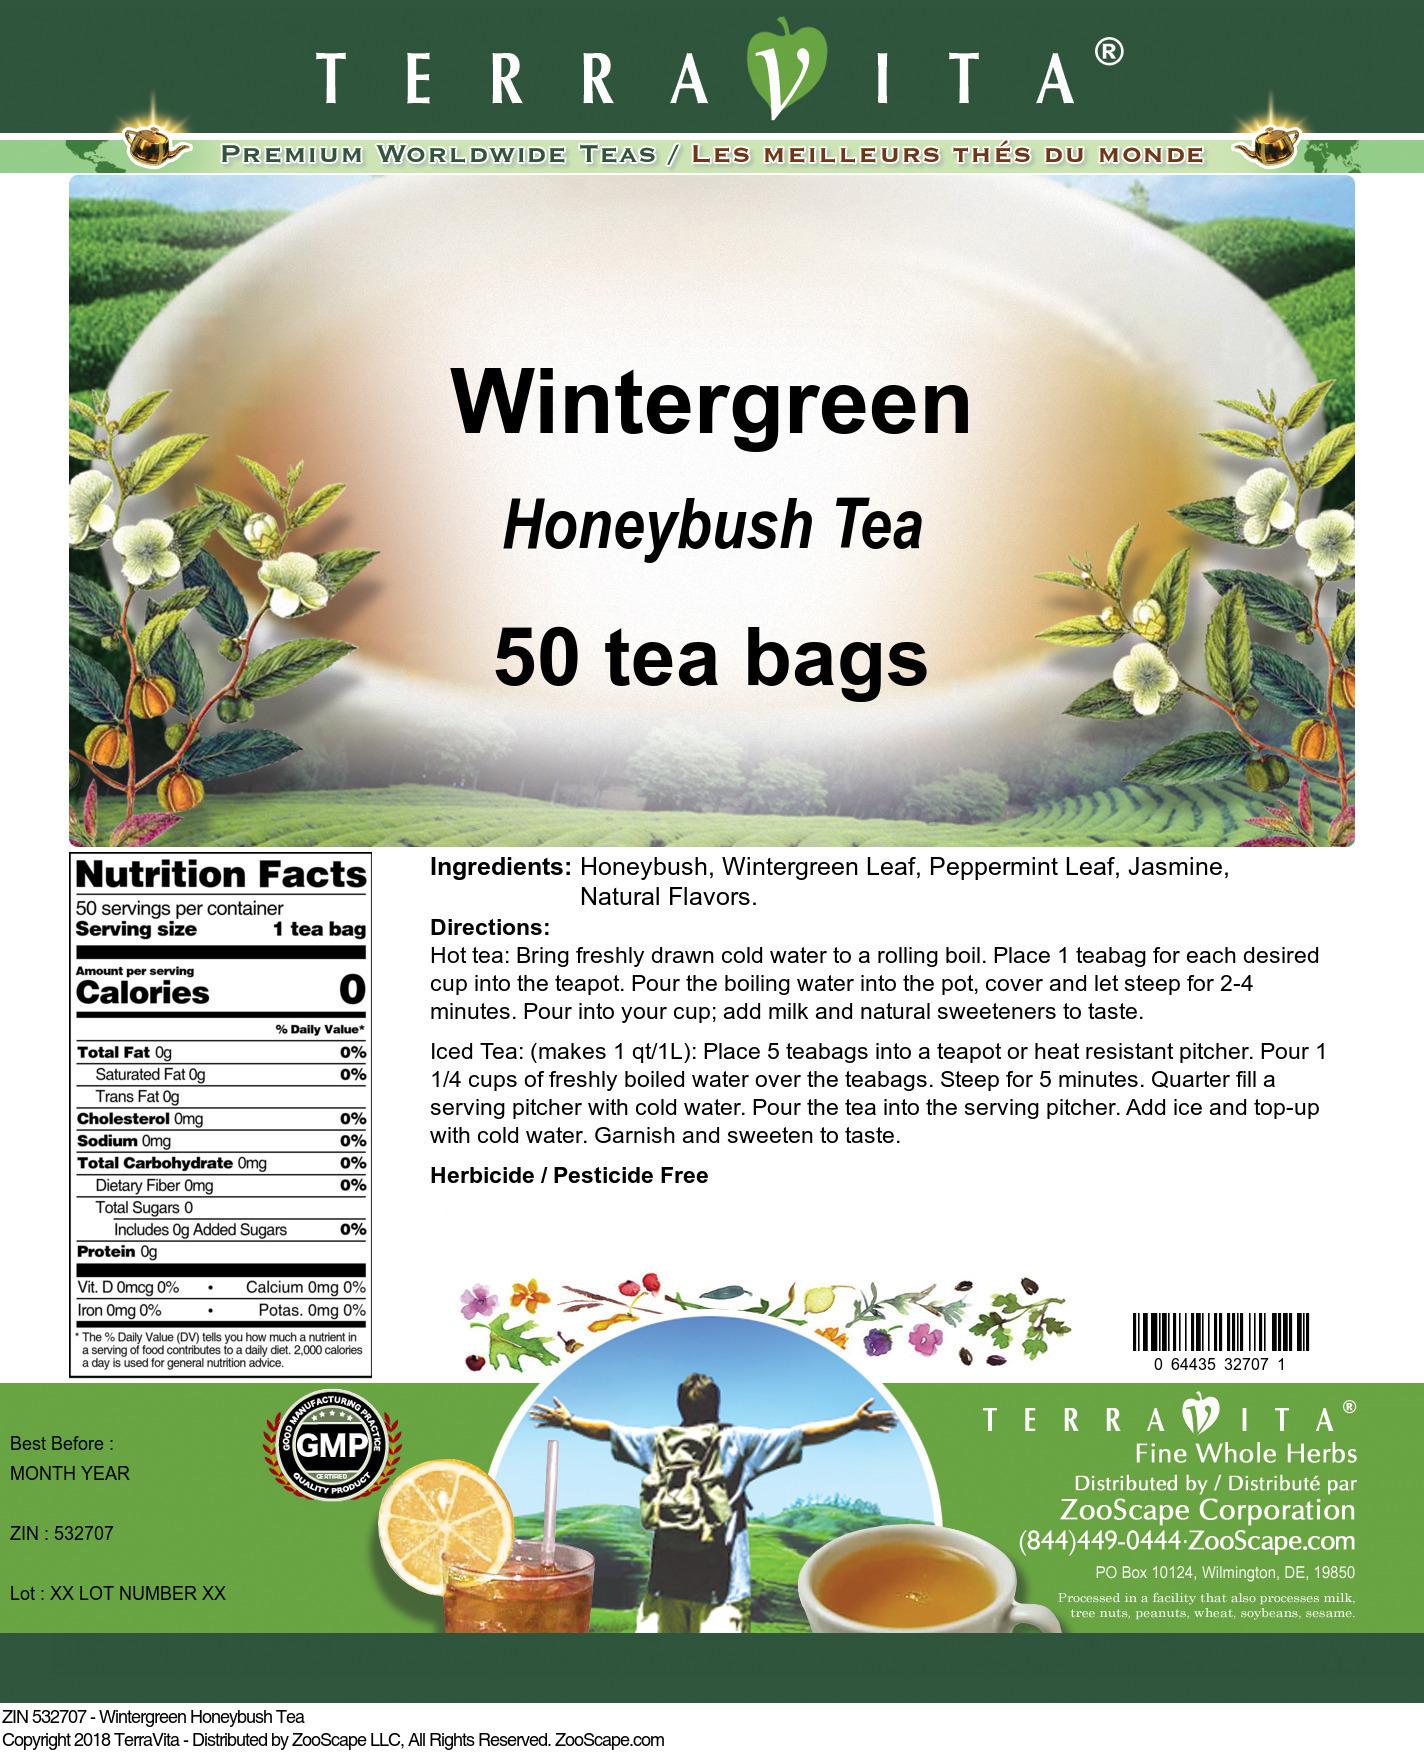 Wintergreen Honeybush Tea